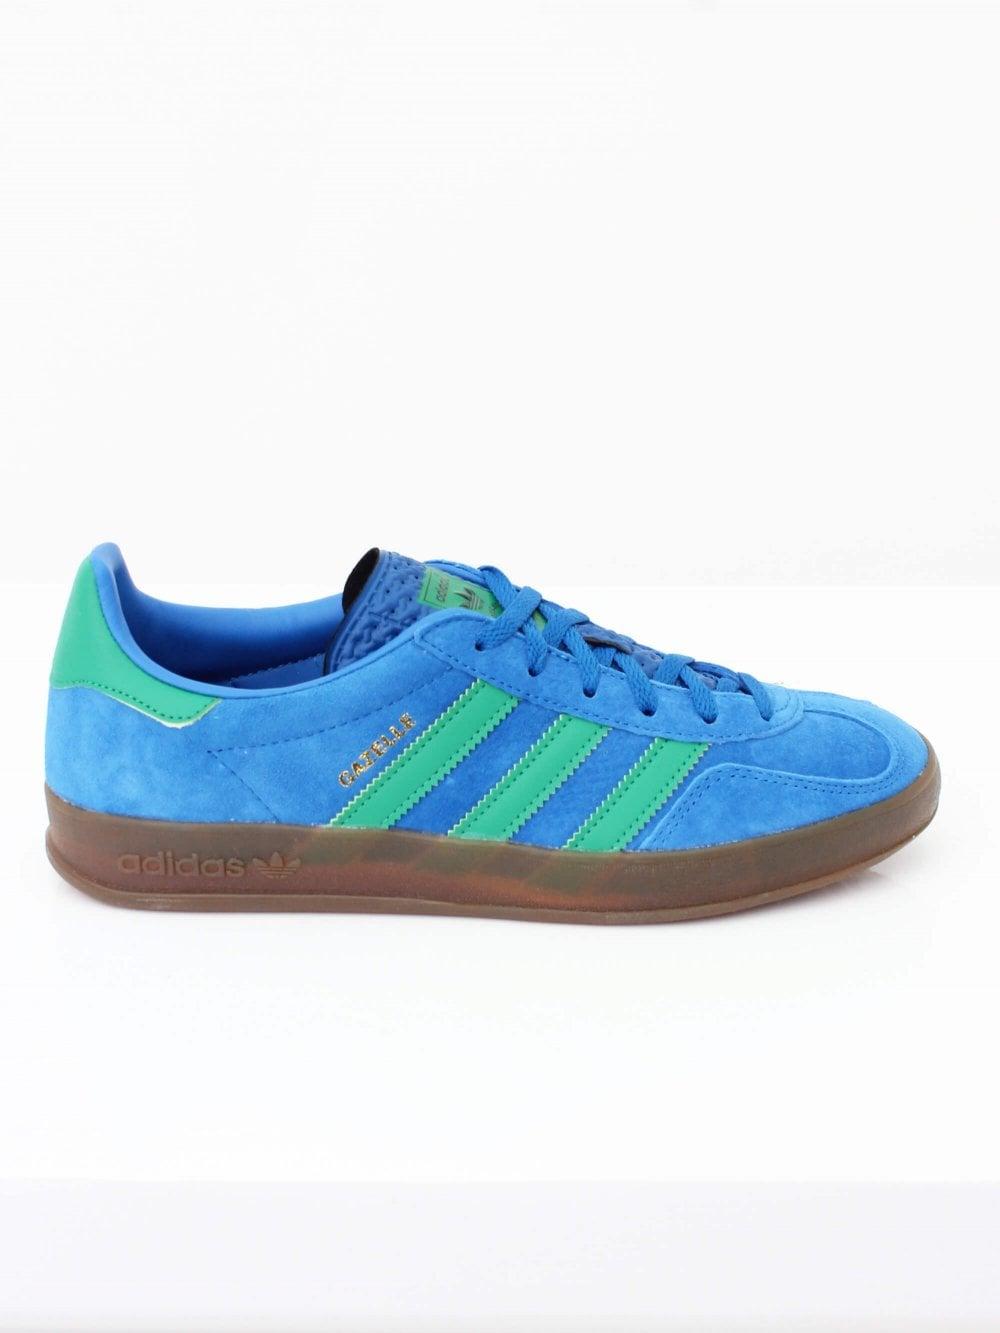 adidas Gazelle Indoor in Blue/Green